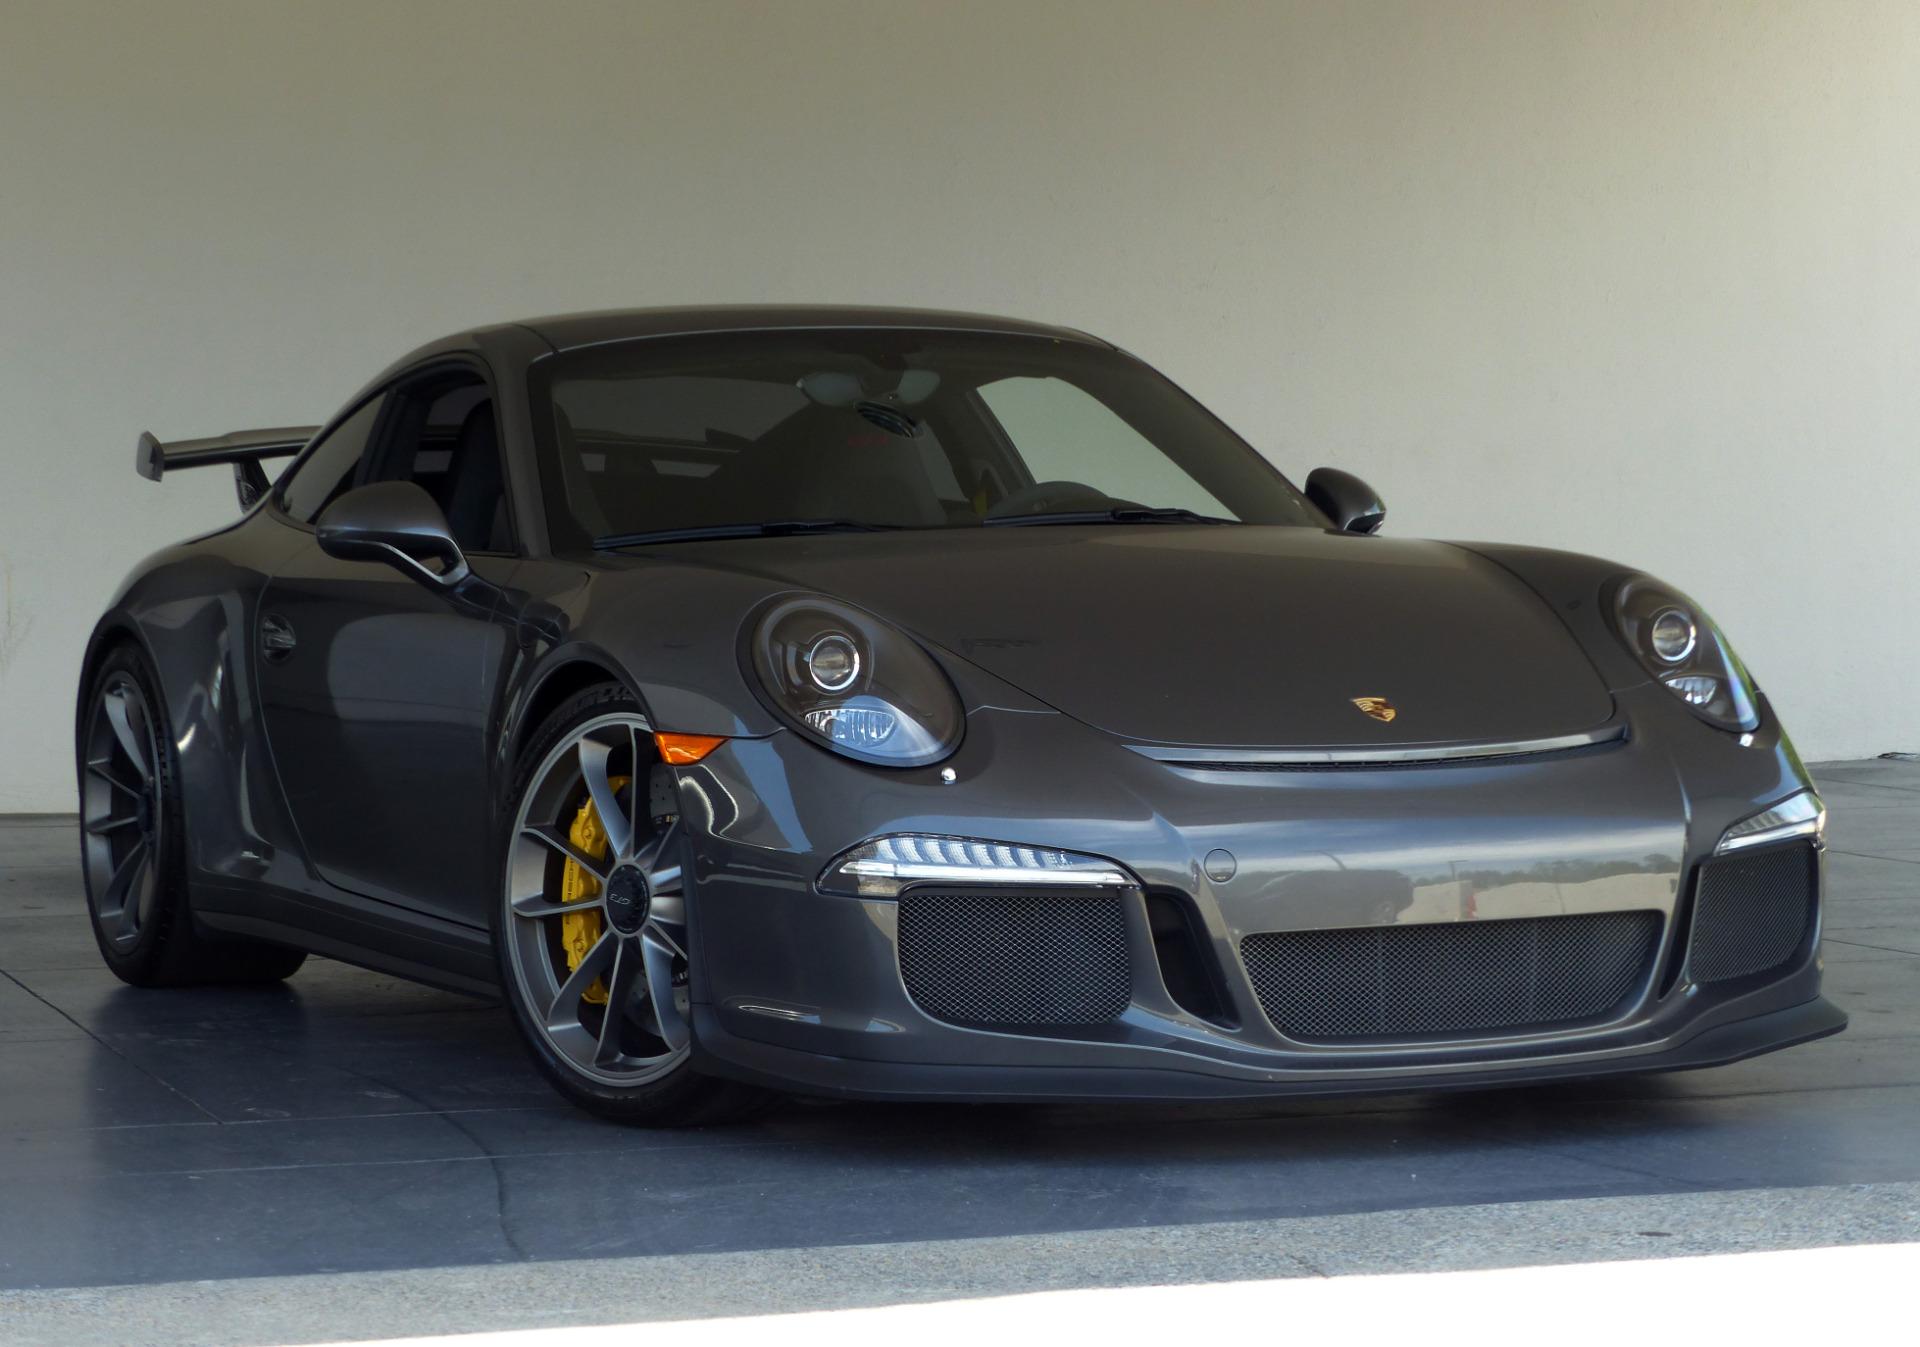 Select Luxury Cars In Marietta Ga: Used 2015 Porsche 911 GT3